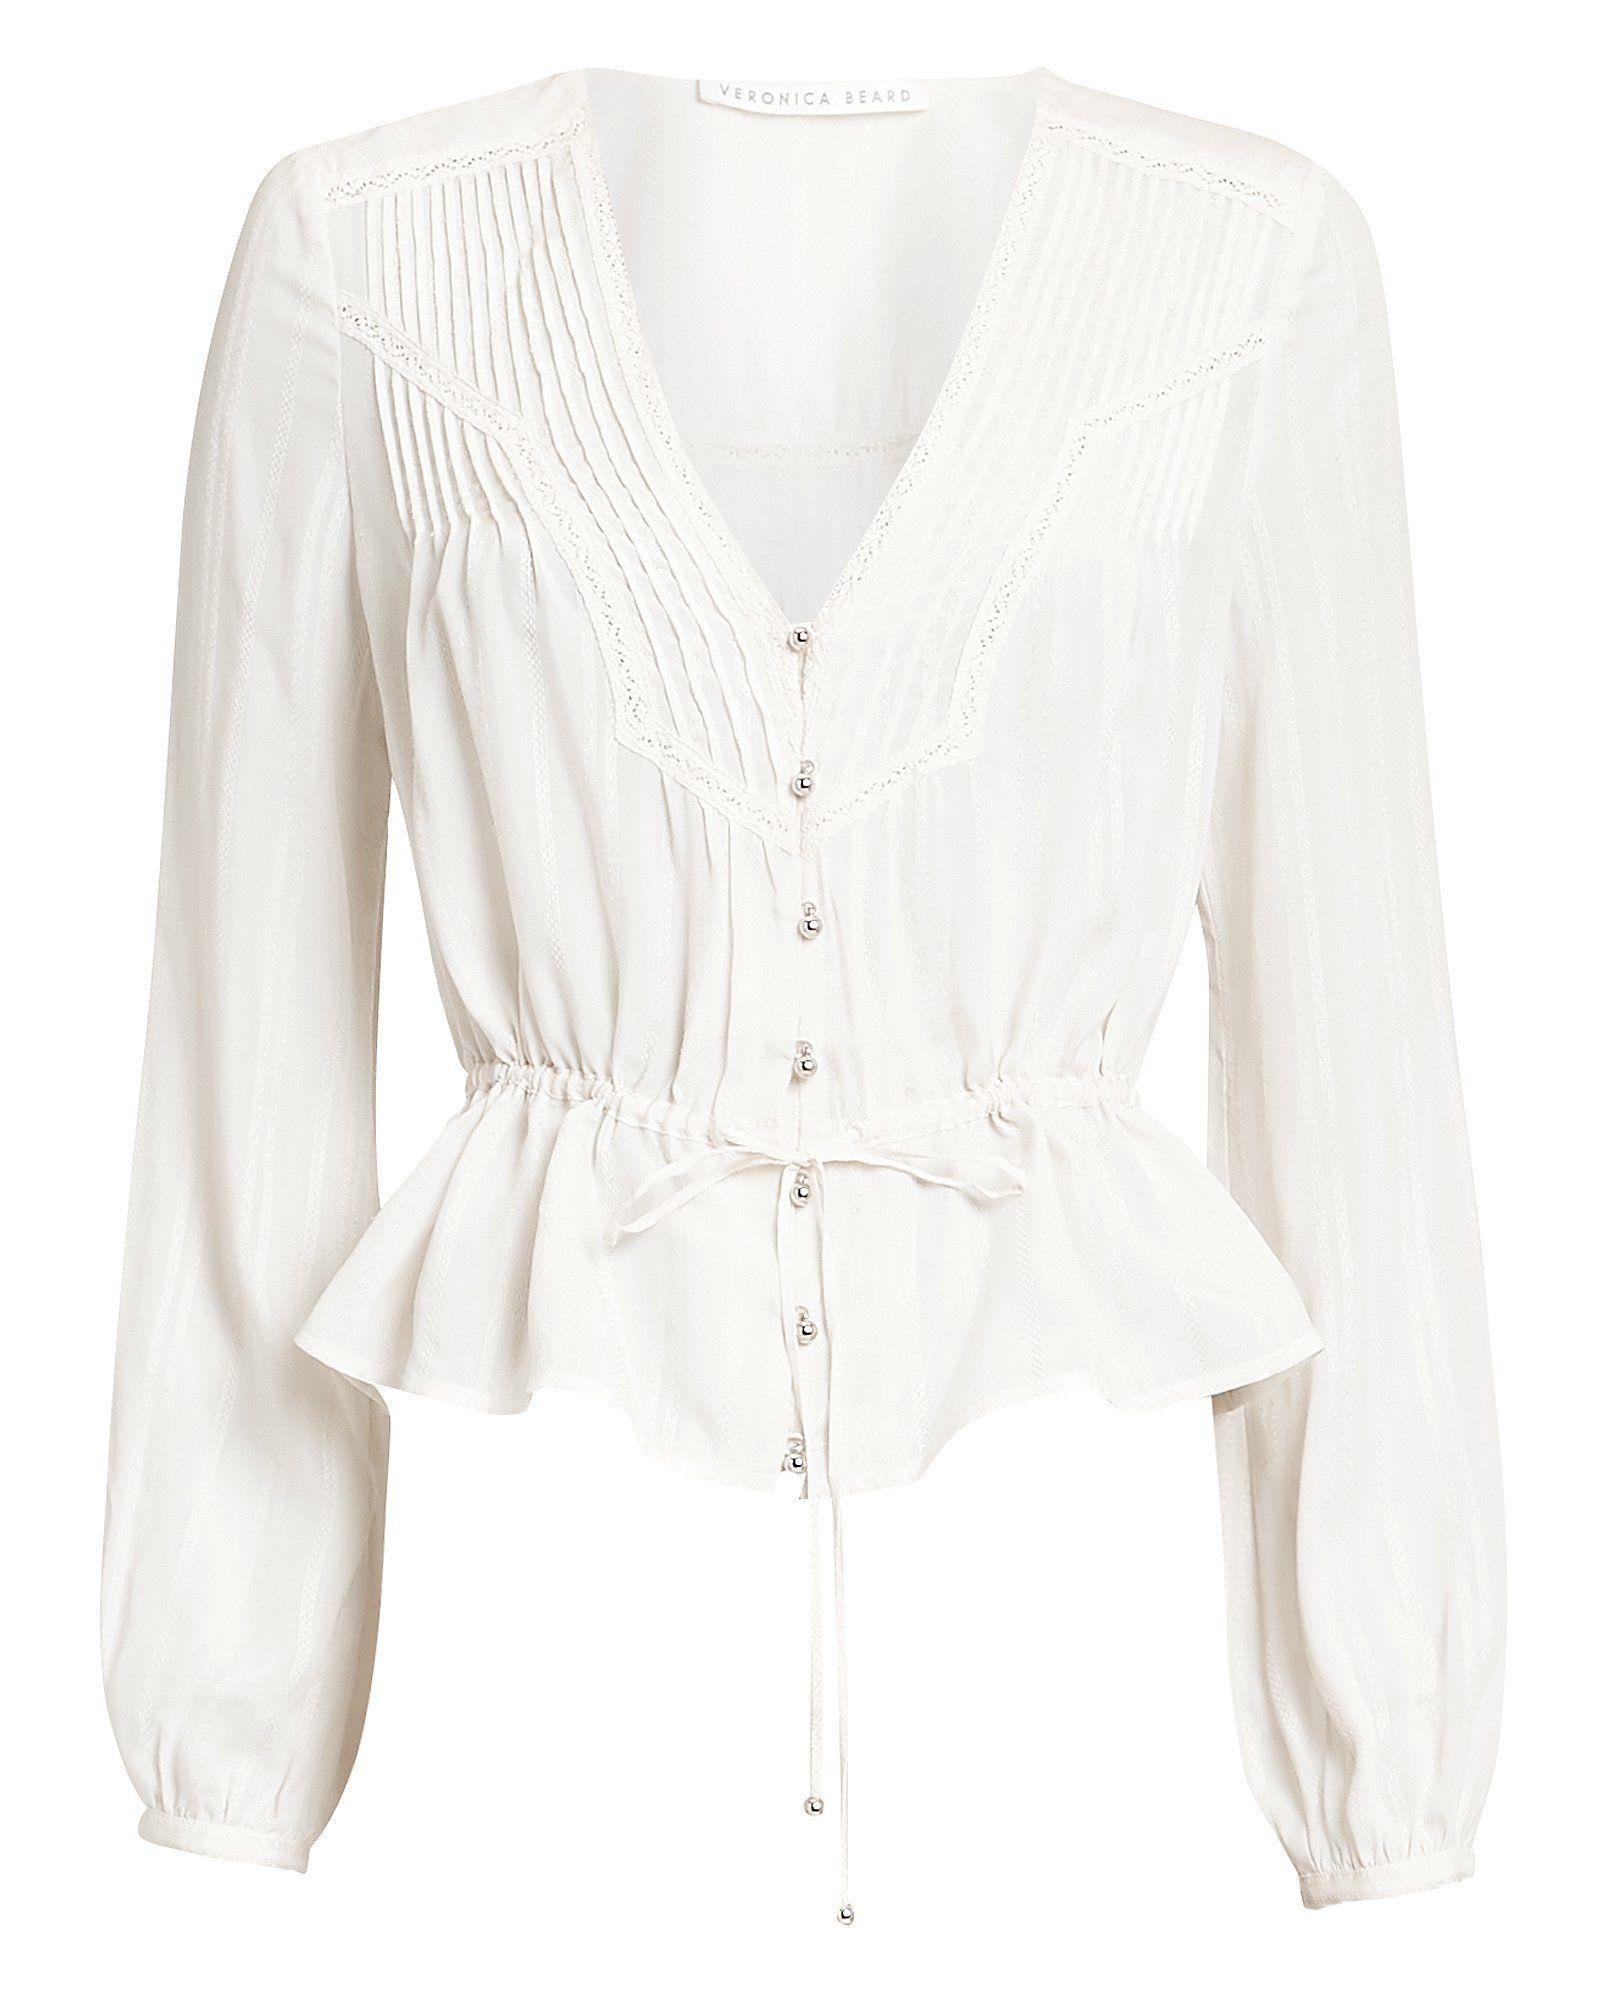 b3cd783d10f VERONICA BEARD PHOEBE DRAWSTRING WAIST BLOUSE WHITE.  veronicabeard  cloth